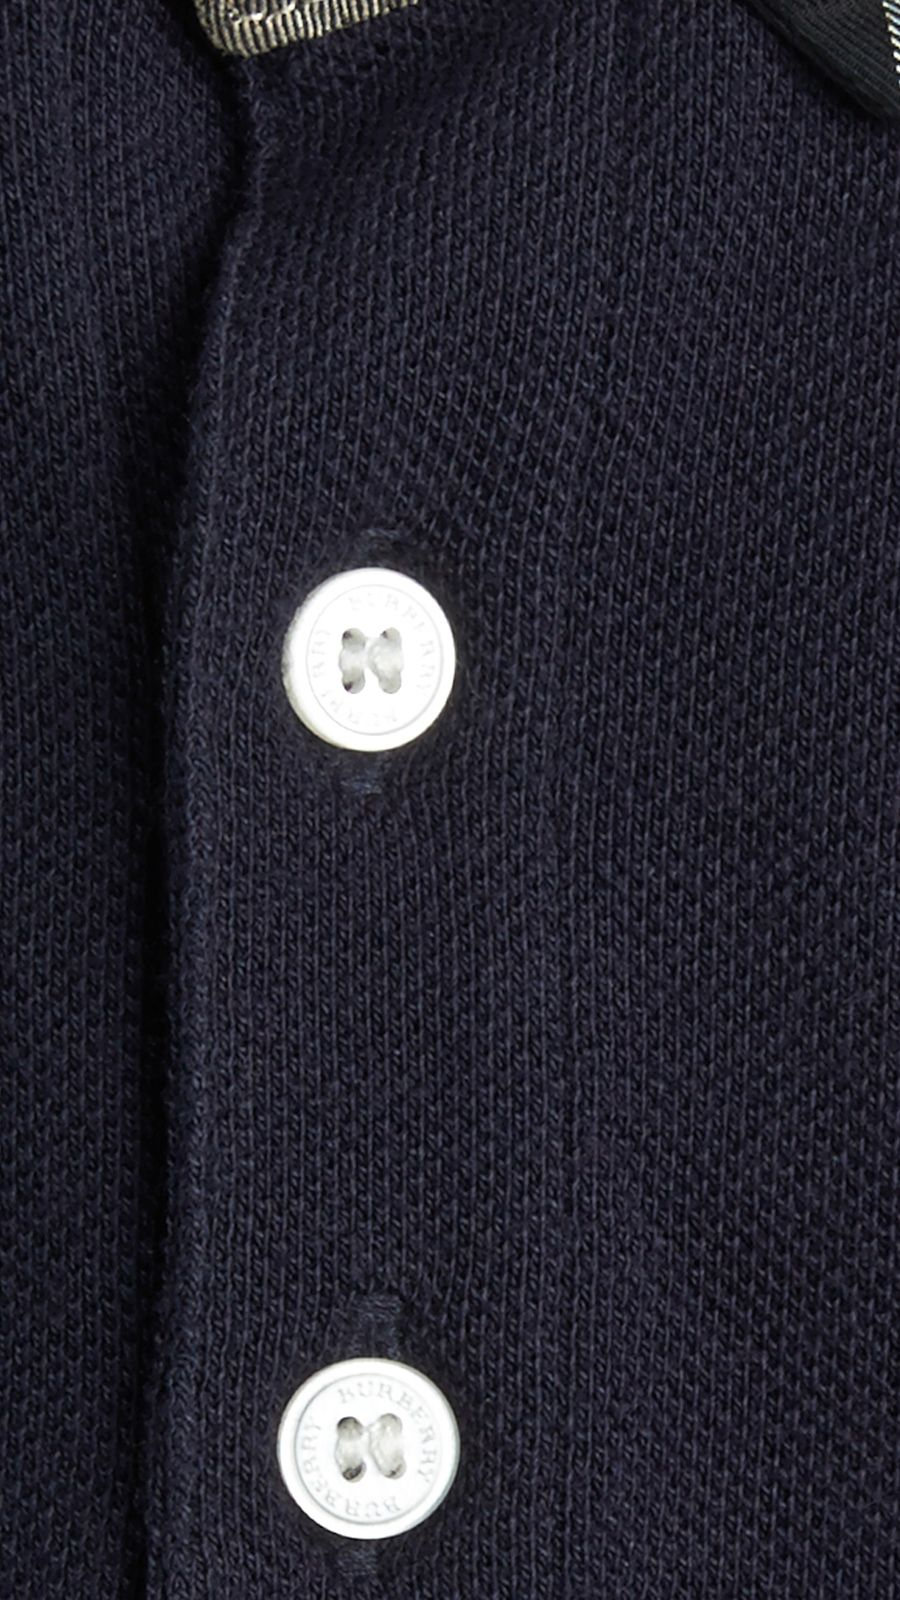 True navy Check Collar Polo Shirt True Navy - Image 2